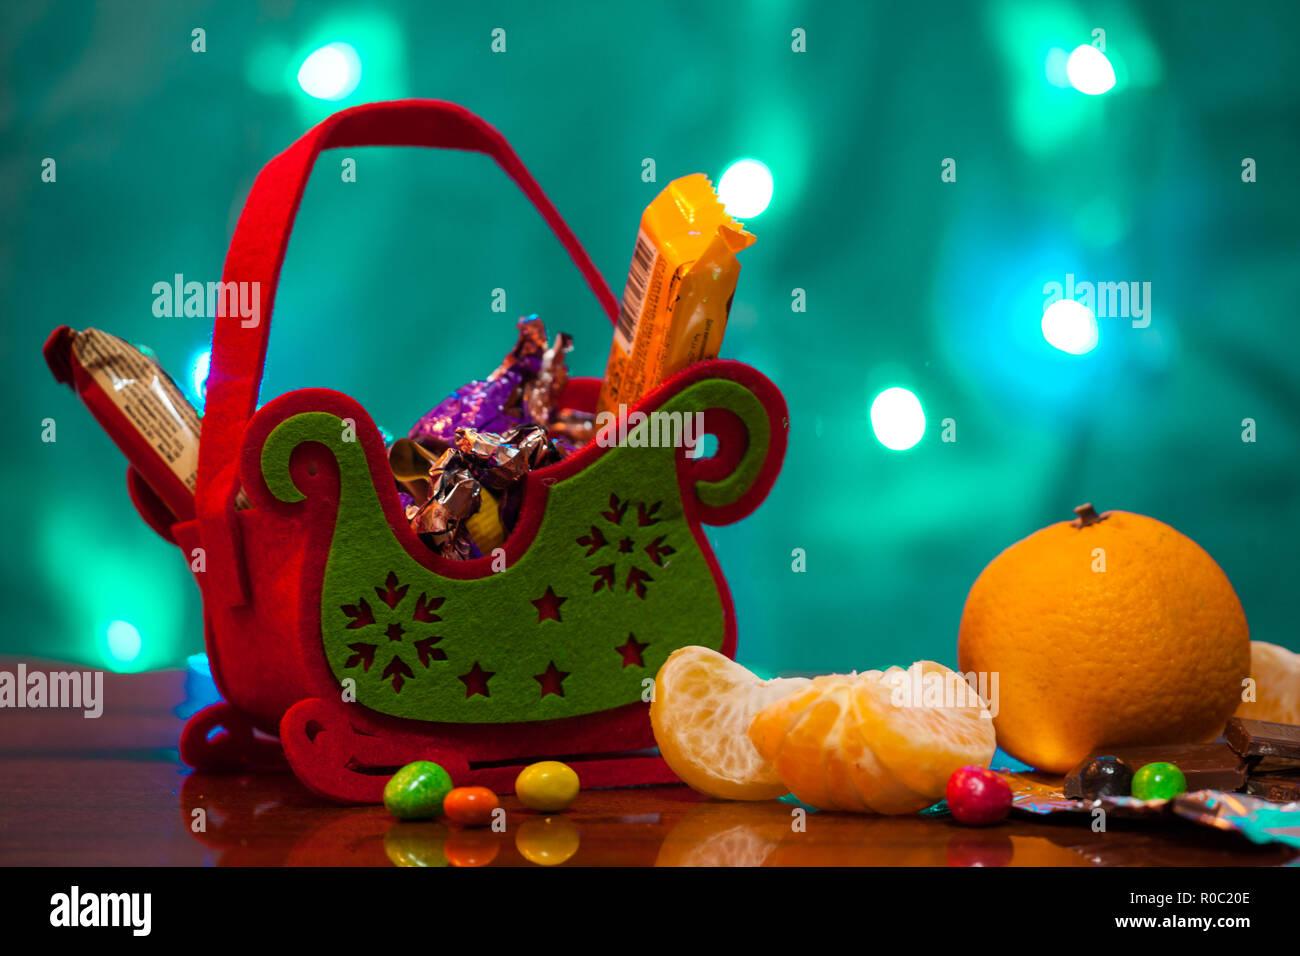 Candy Christmas Sleigh Of Surprises Christmas Holiday Gift Basket